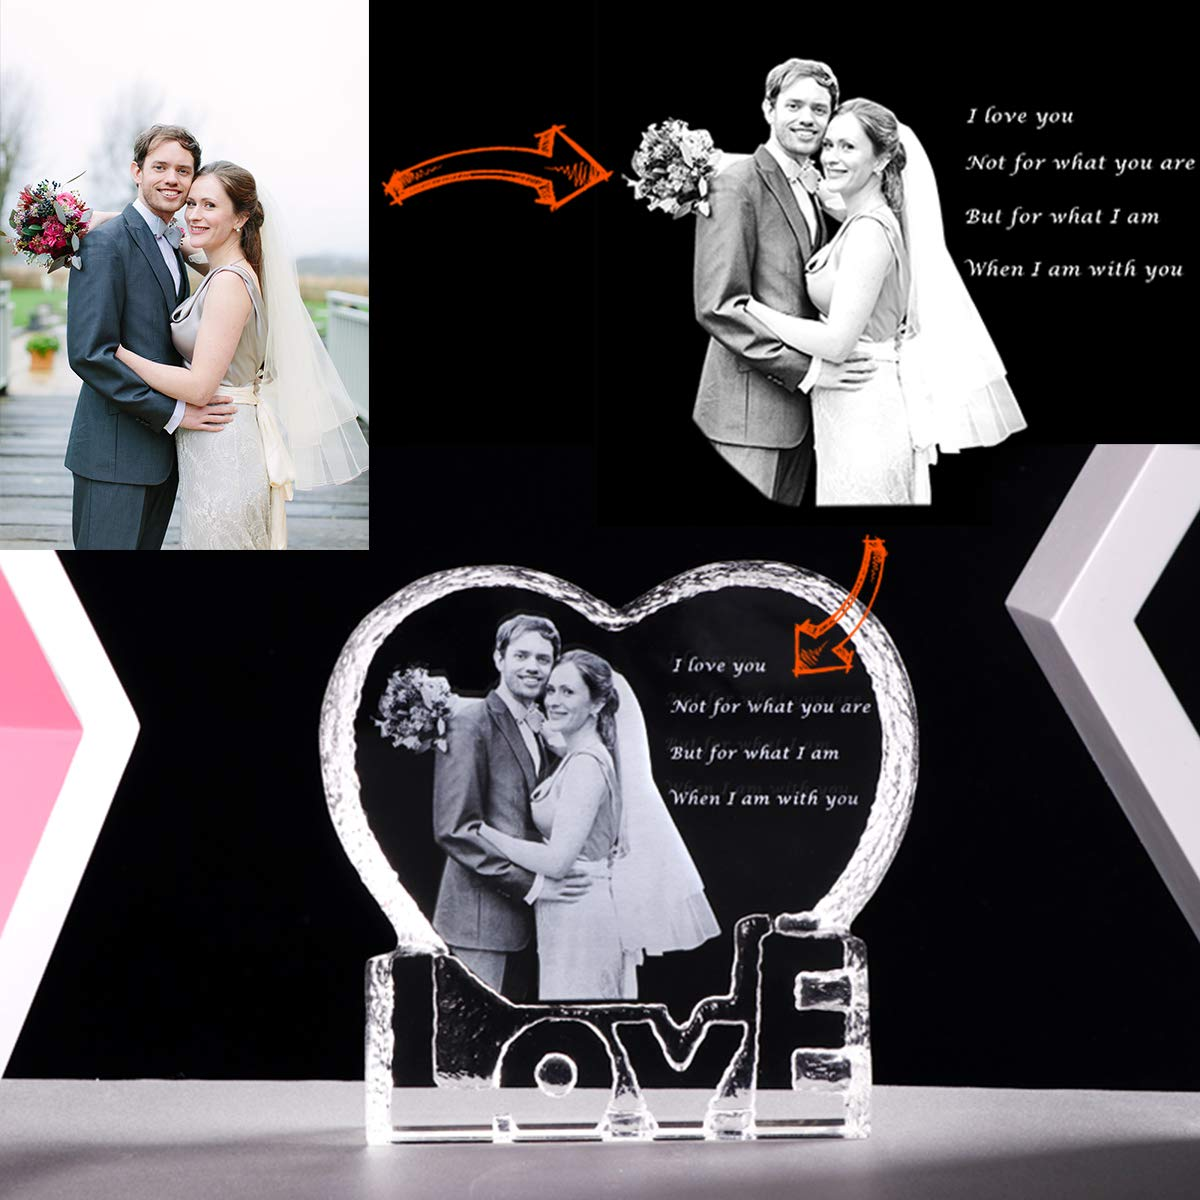 Perfect Wedding Anniversary Gift For Husband: YWHL Custom Photo Wedding Anniversary Sculpture